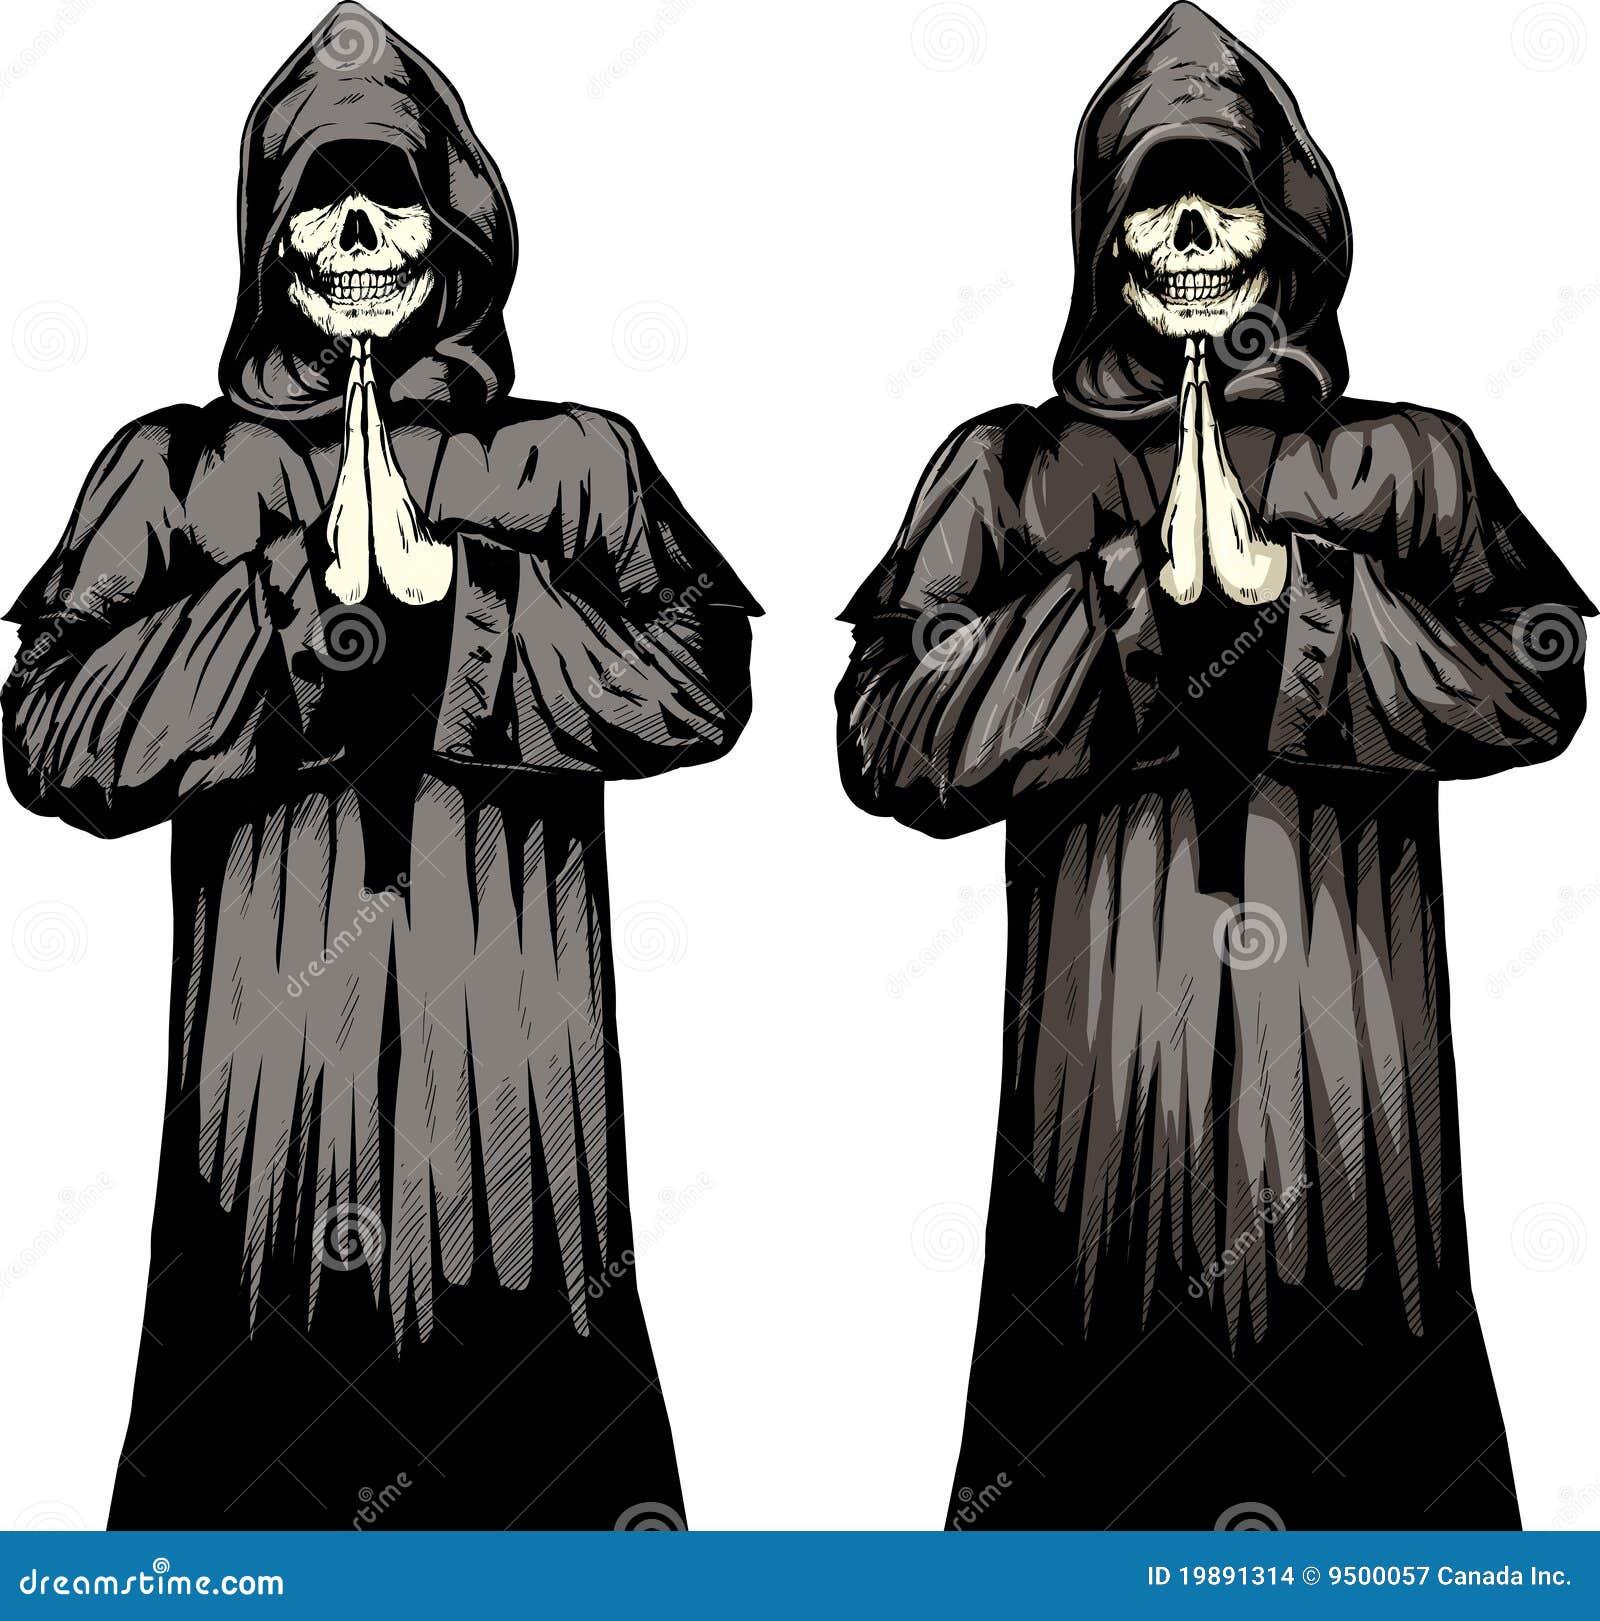 Undead monk